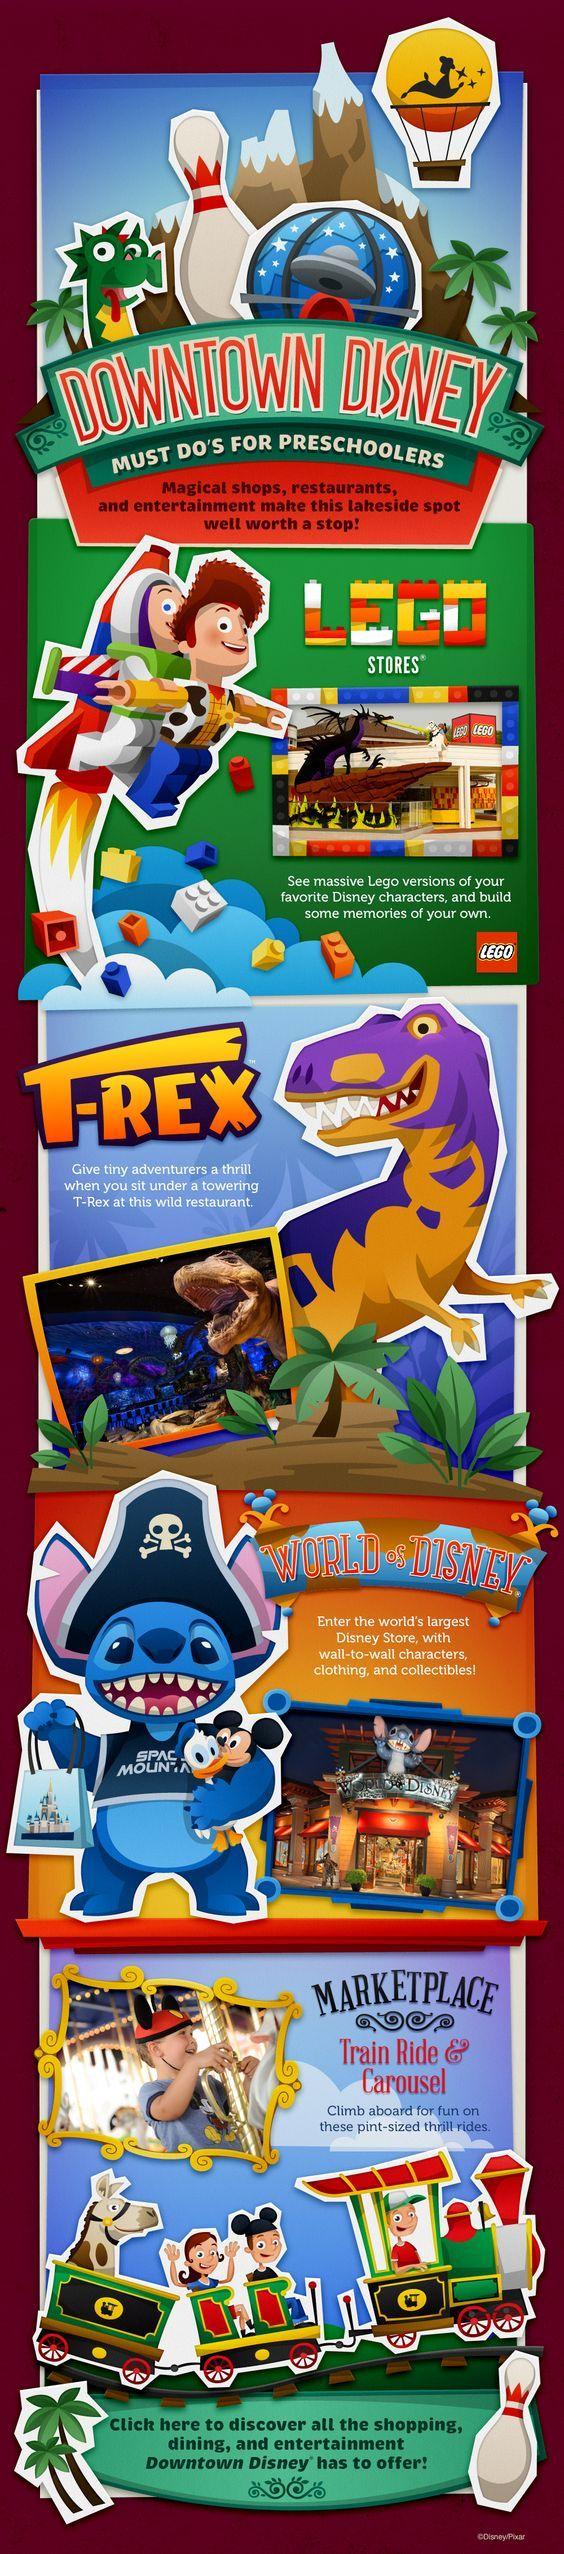 Downtown Disney Must Do's for Preschoolers! LEGO, T-REX, World of Disney…